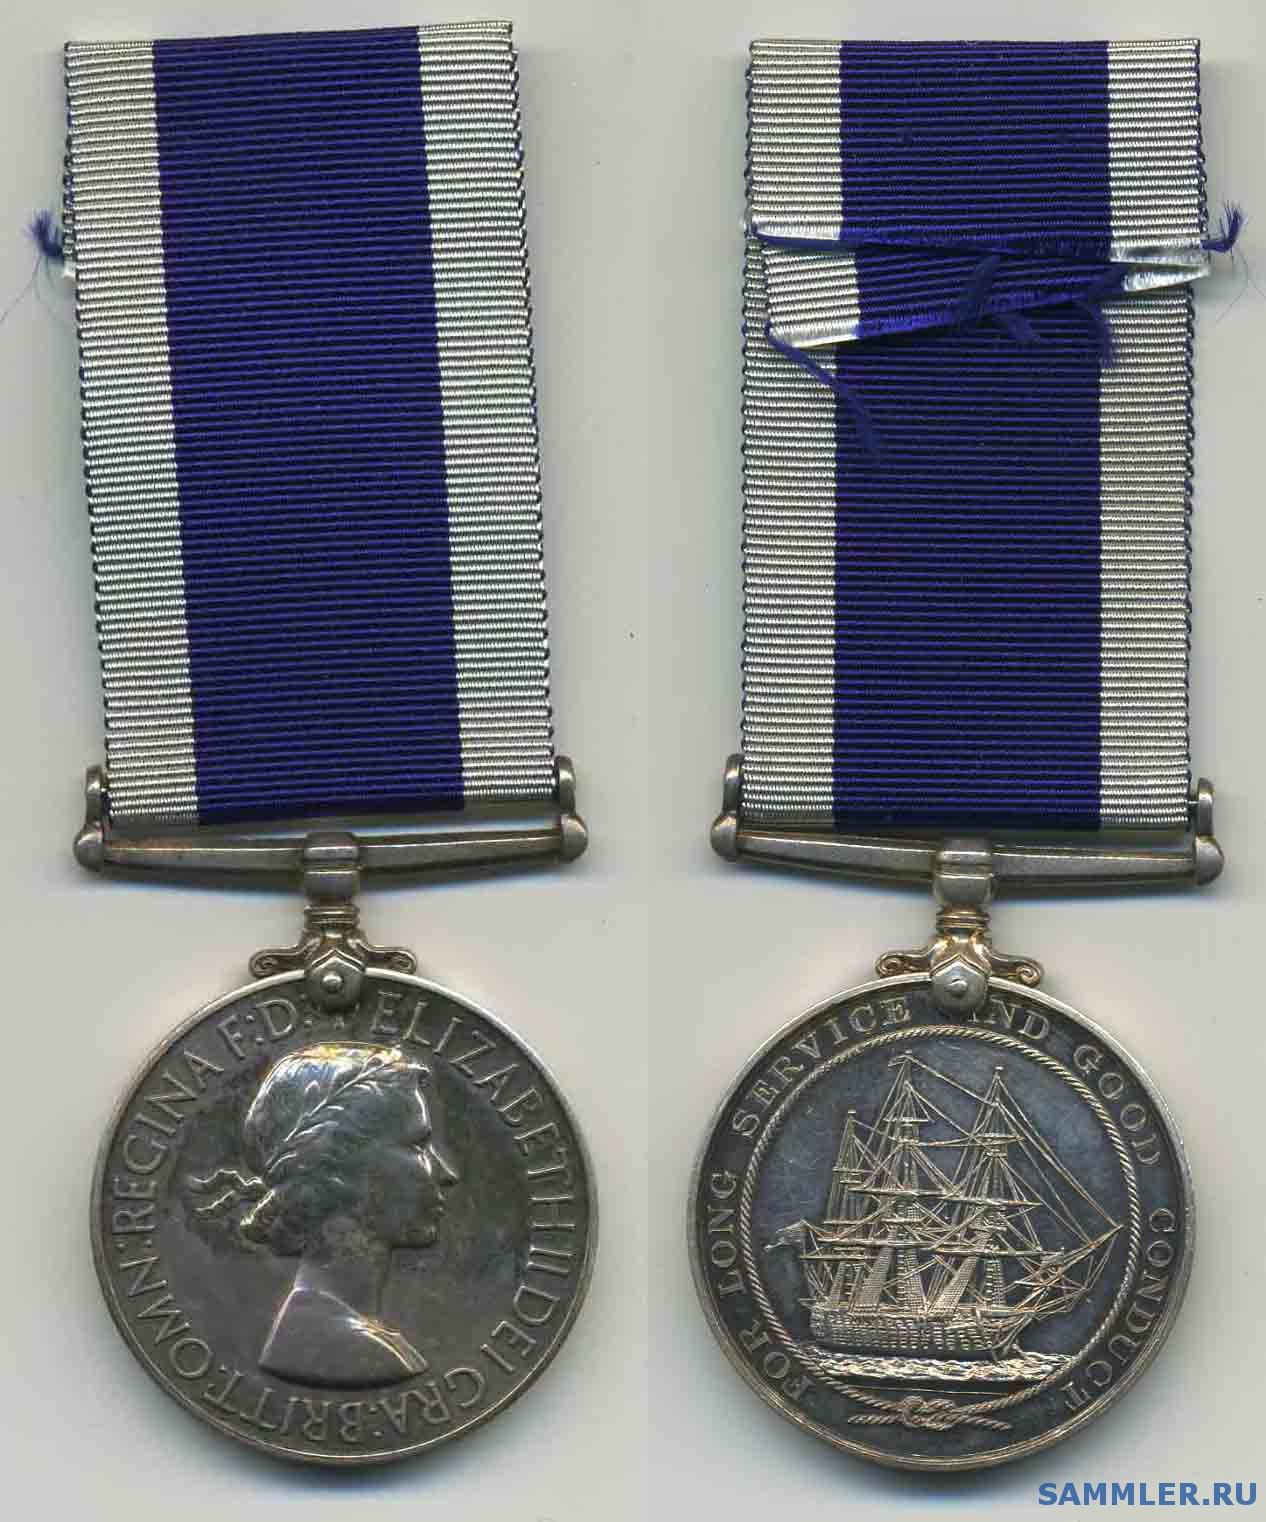 Royal_Naval_LS_GC_Medal_EII_2_.jpg